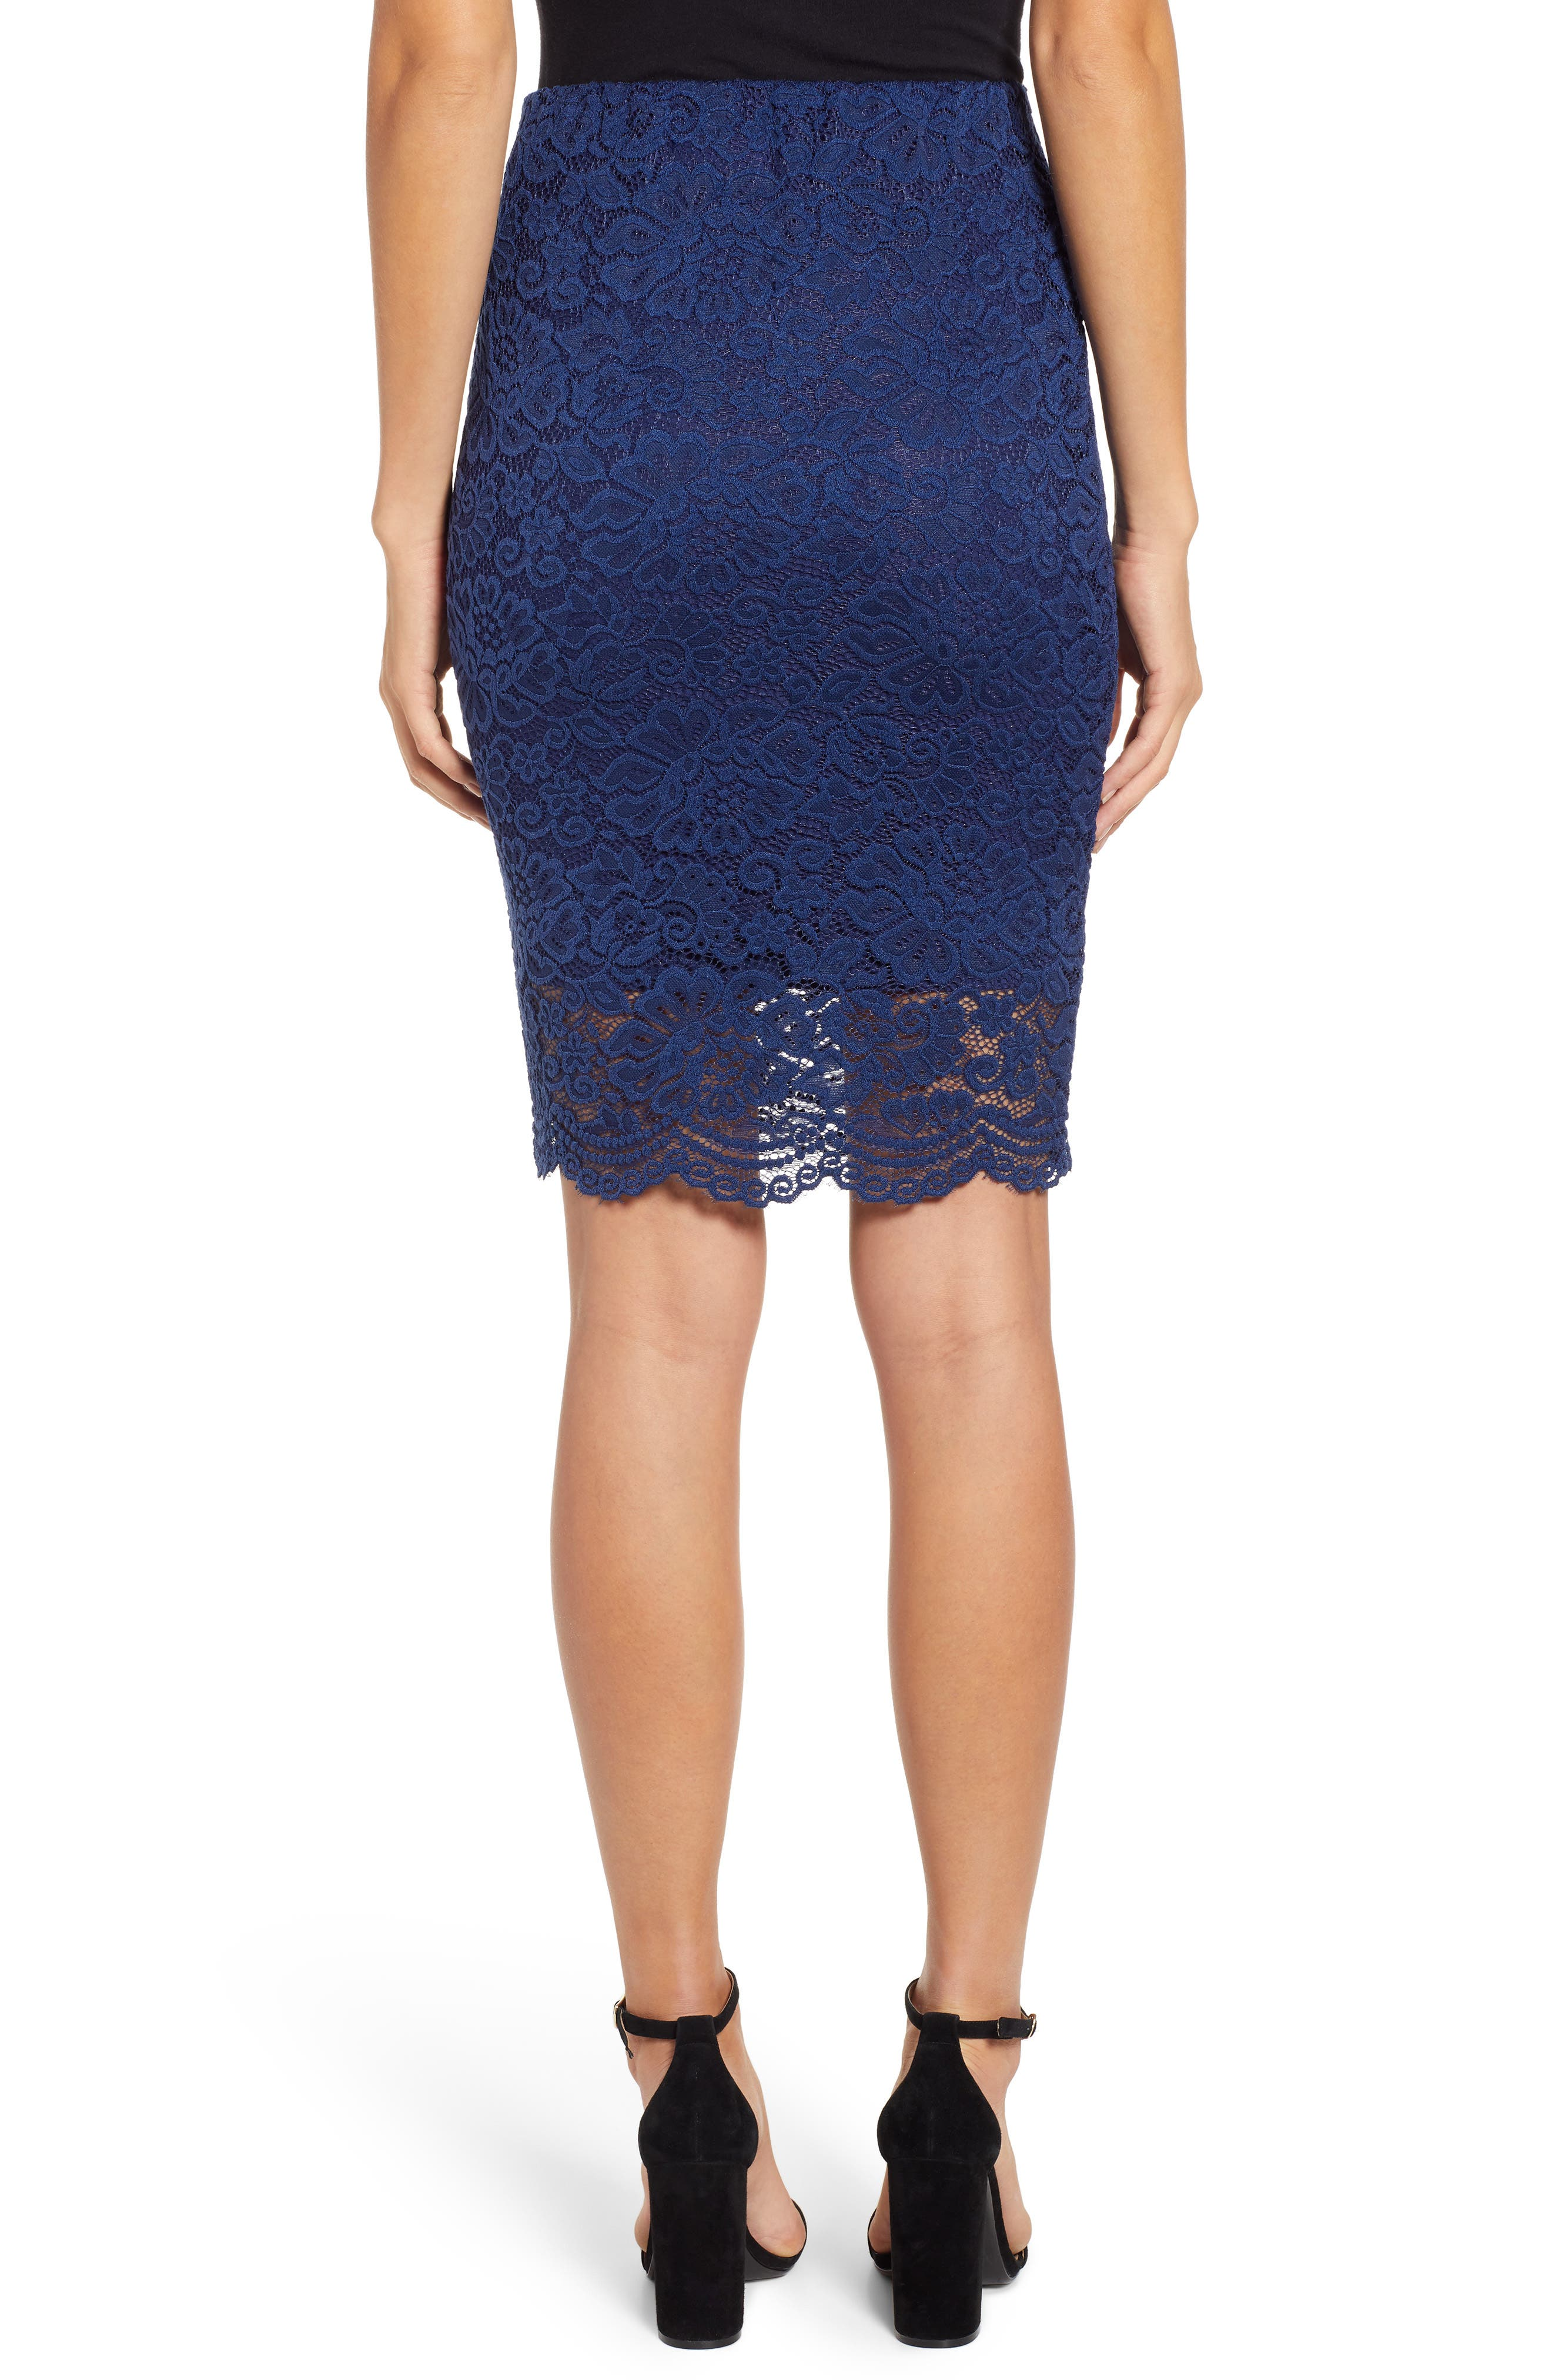 ROSEMUNDE, Filippa Scalloped Lace Skirt, Alternate thumbnail 2, color, NAVY PEONY